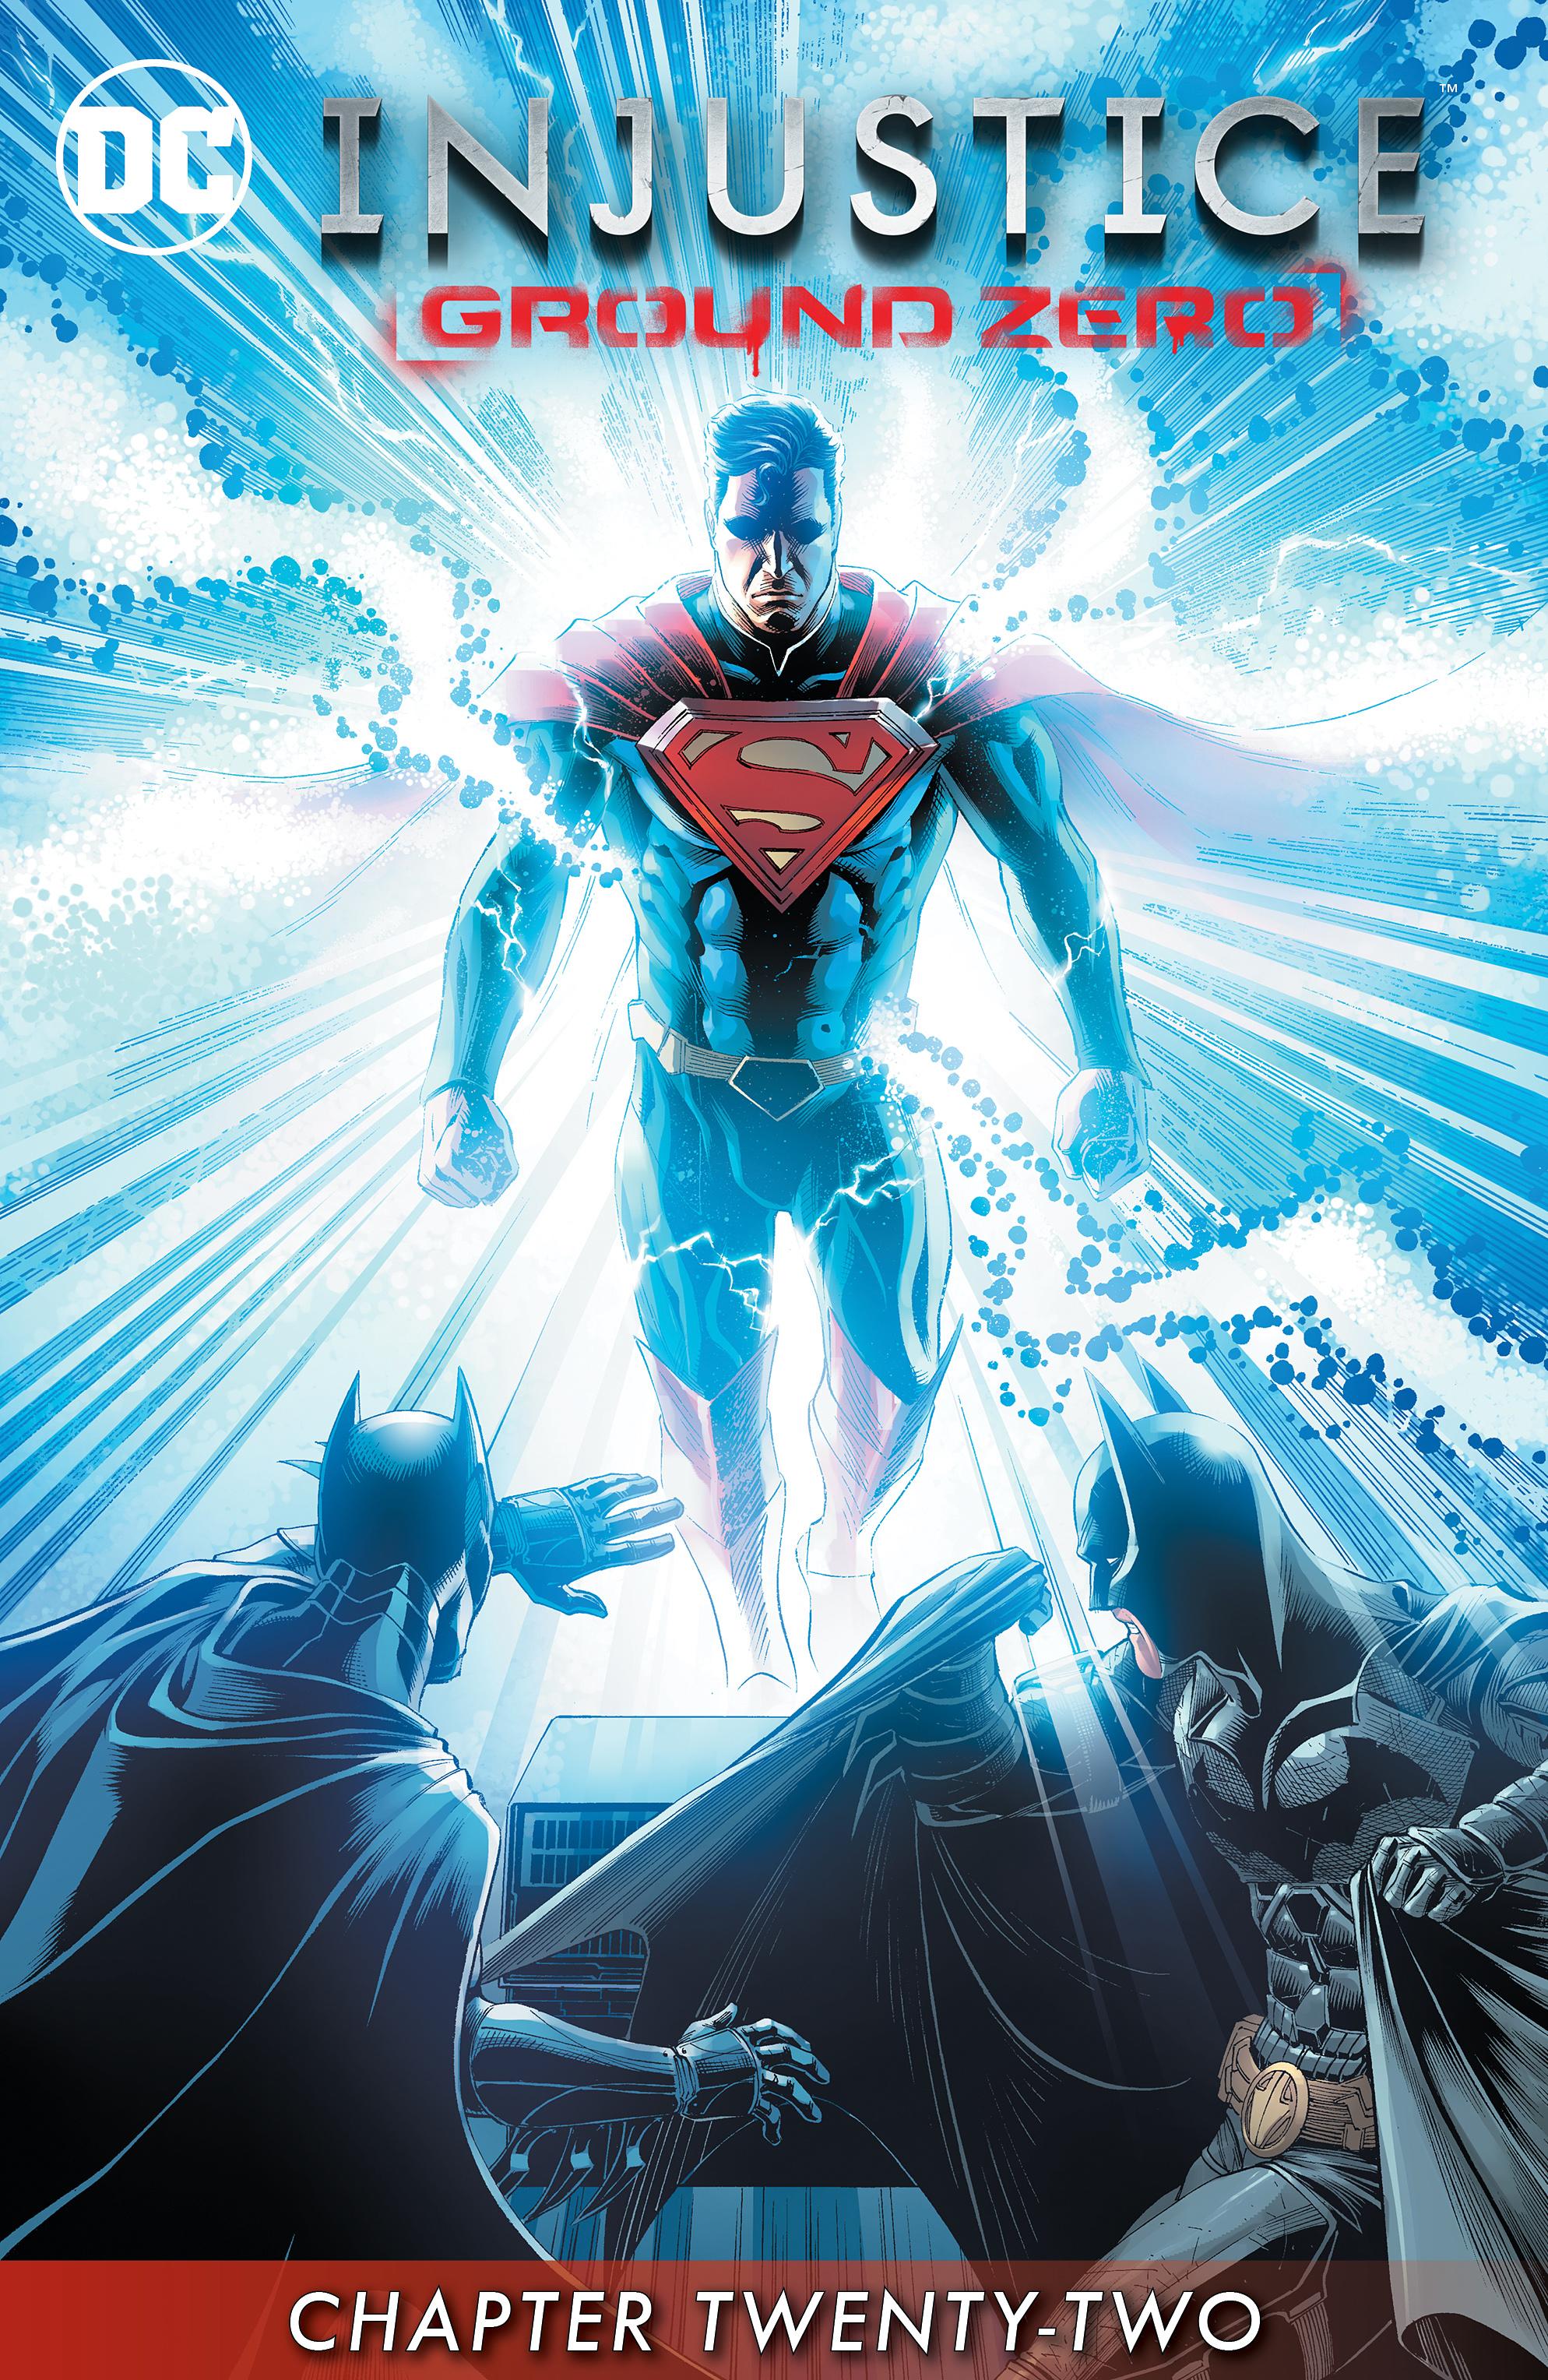 Read online Injustice: Ground Zero comic -  Issue #22 - 2